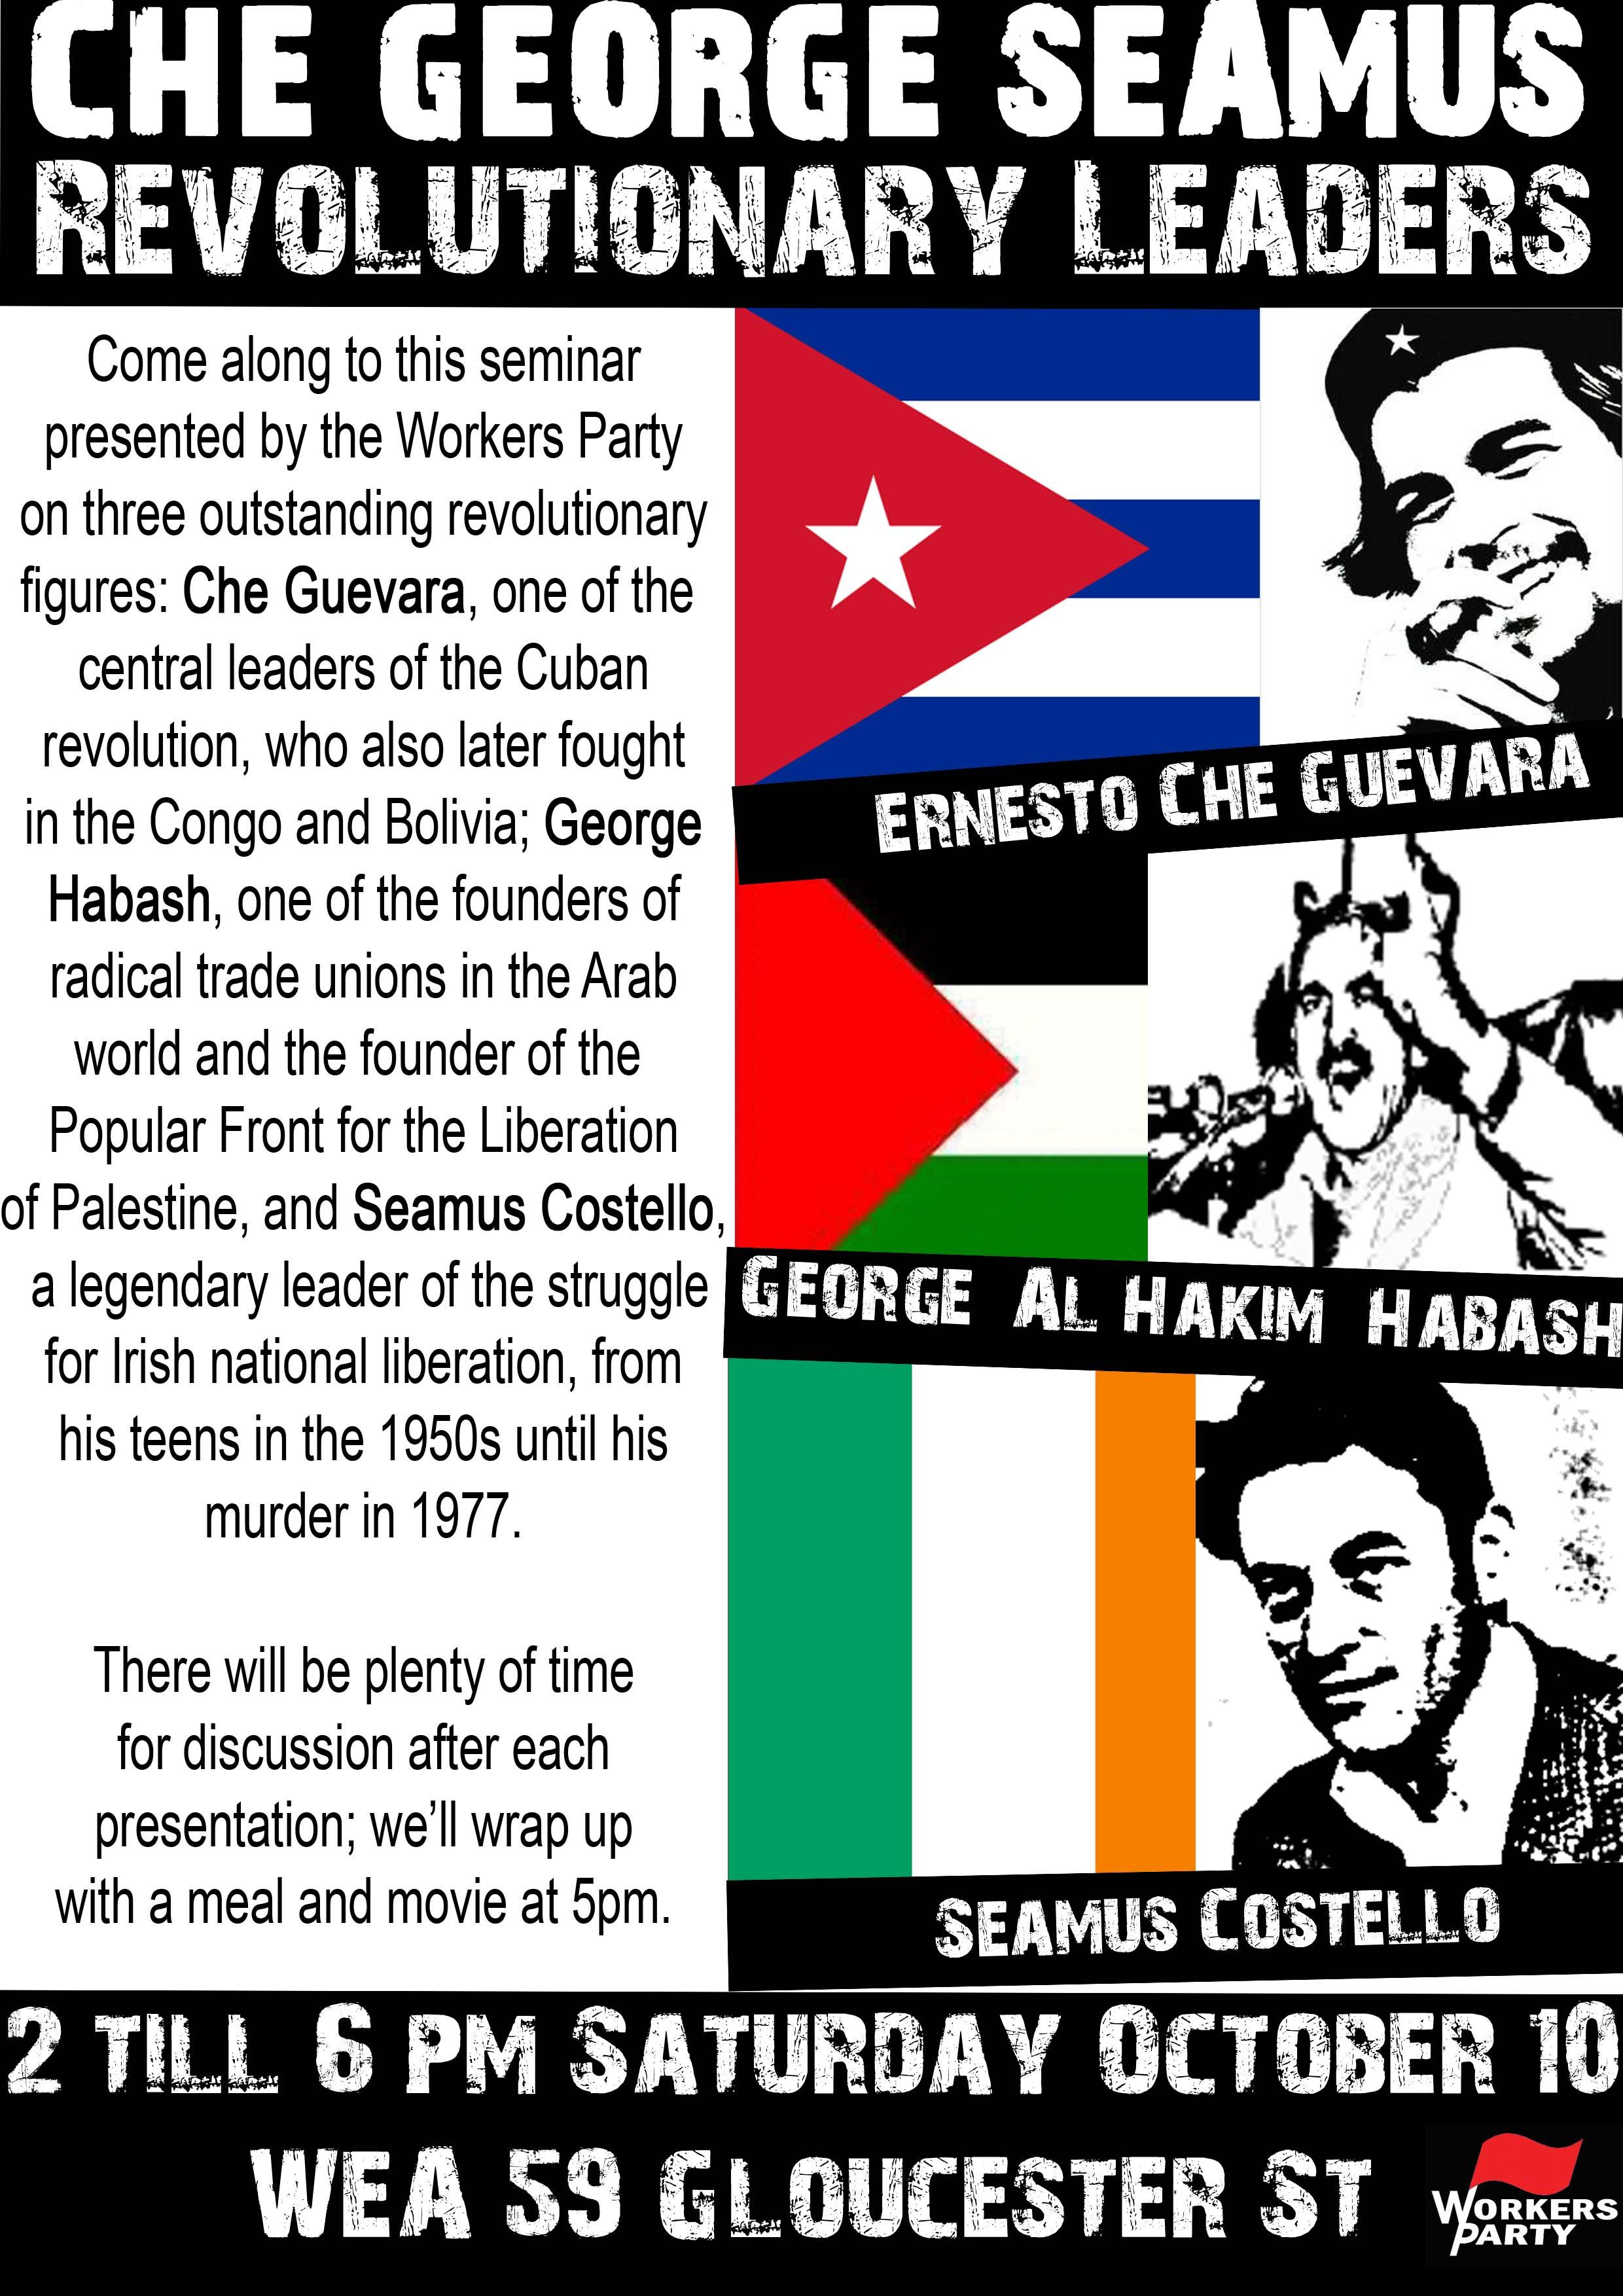 Revolutionary leaders